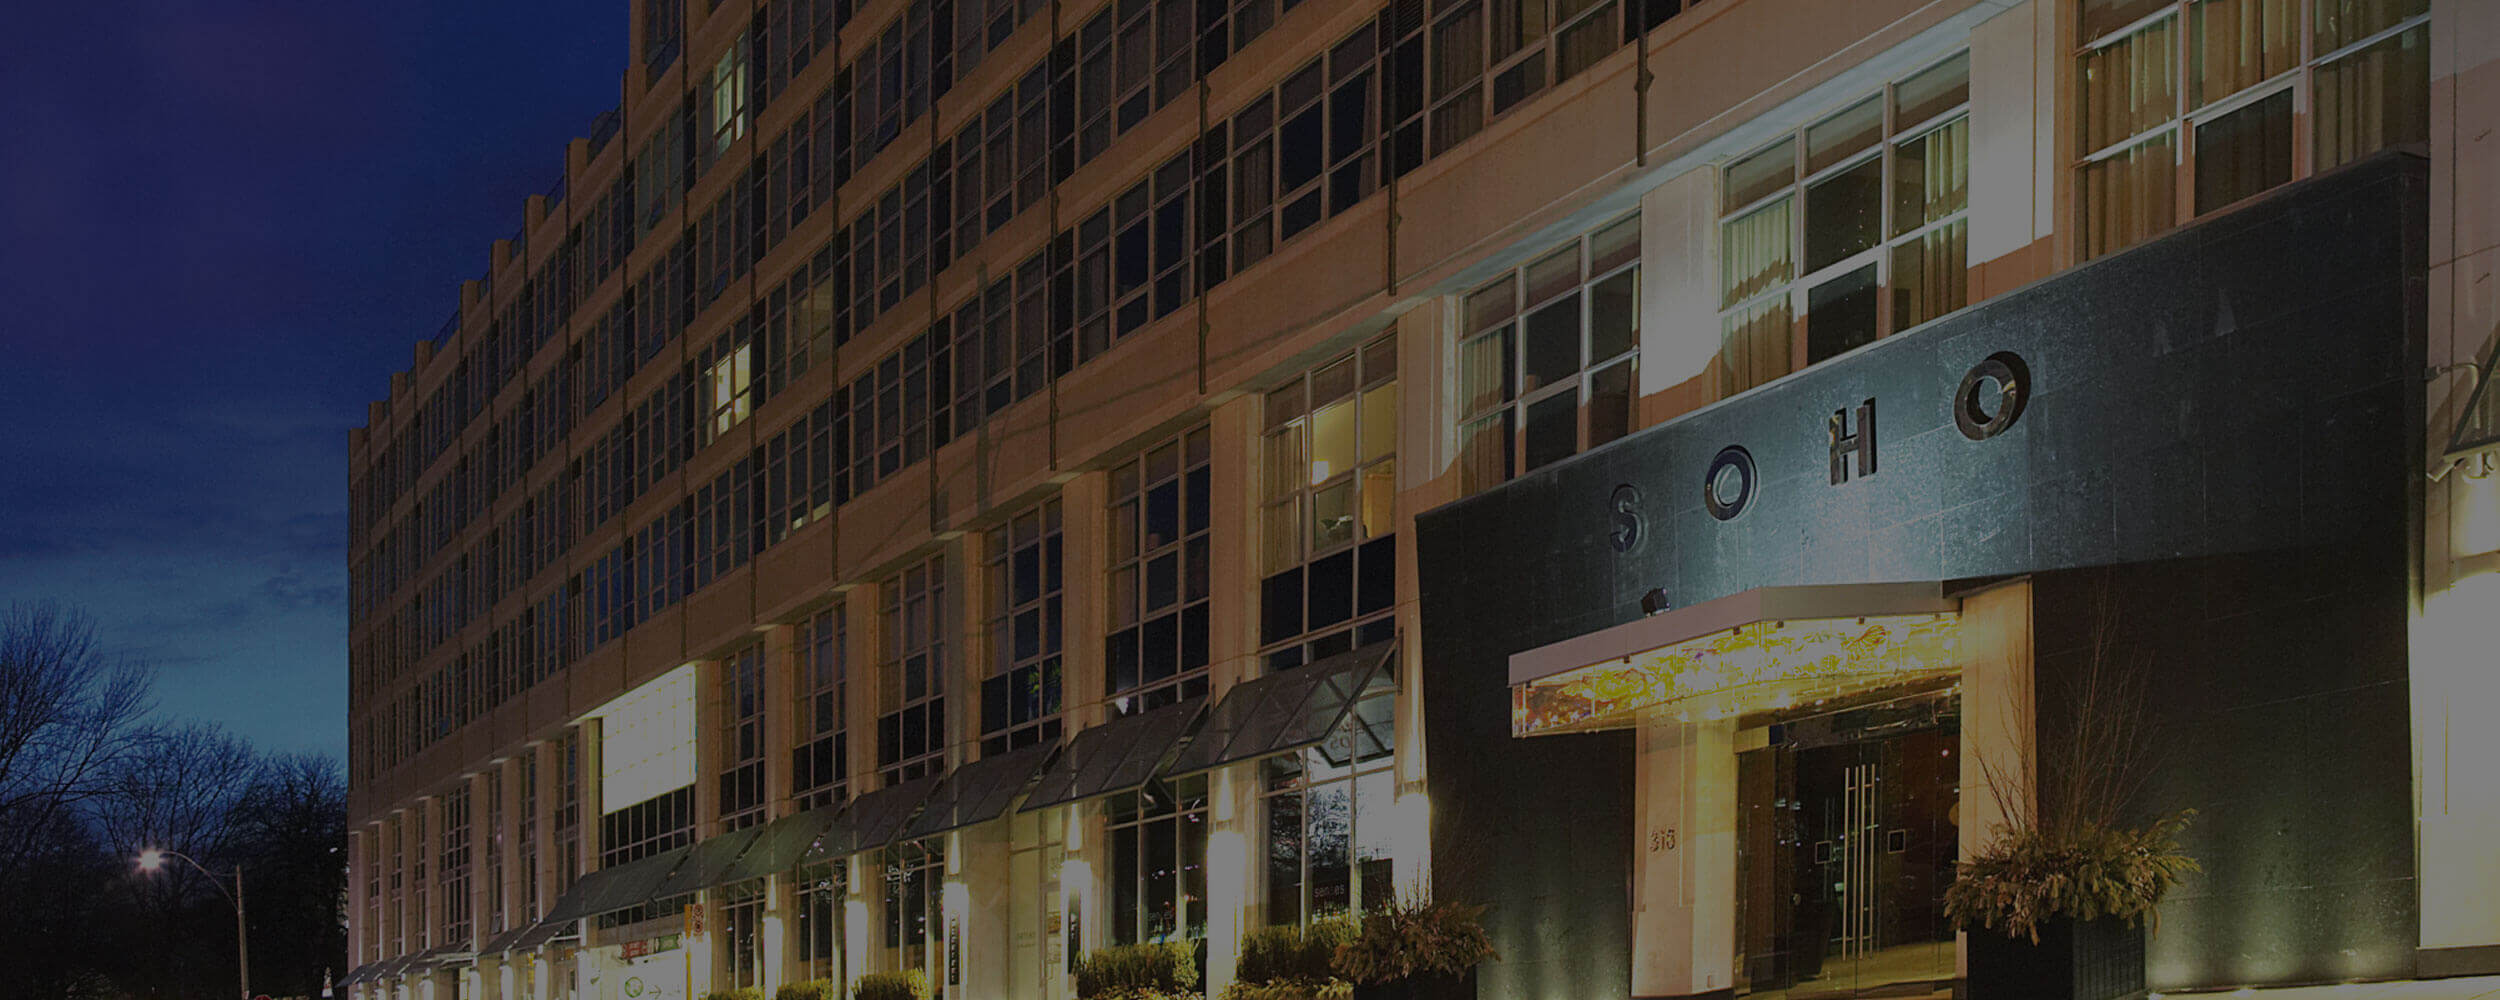 SoHo Hotel exterior front entrance at night